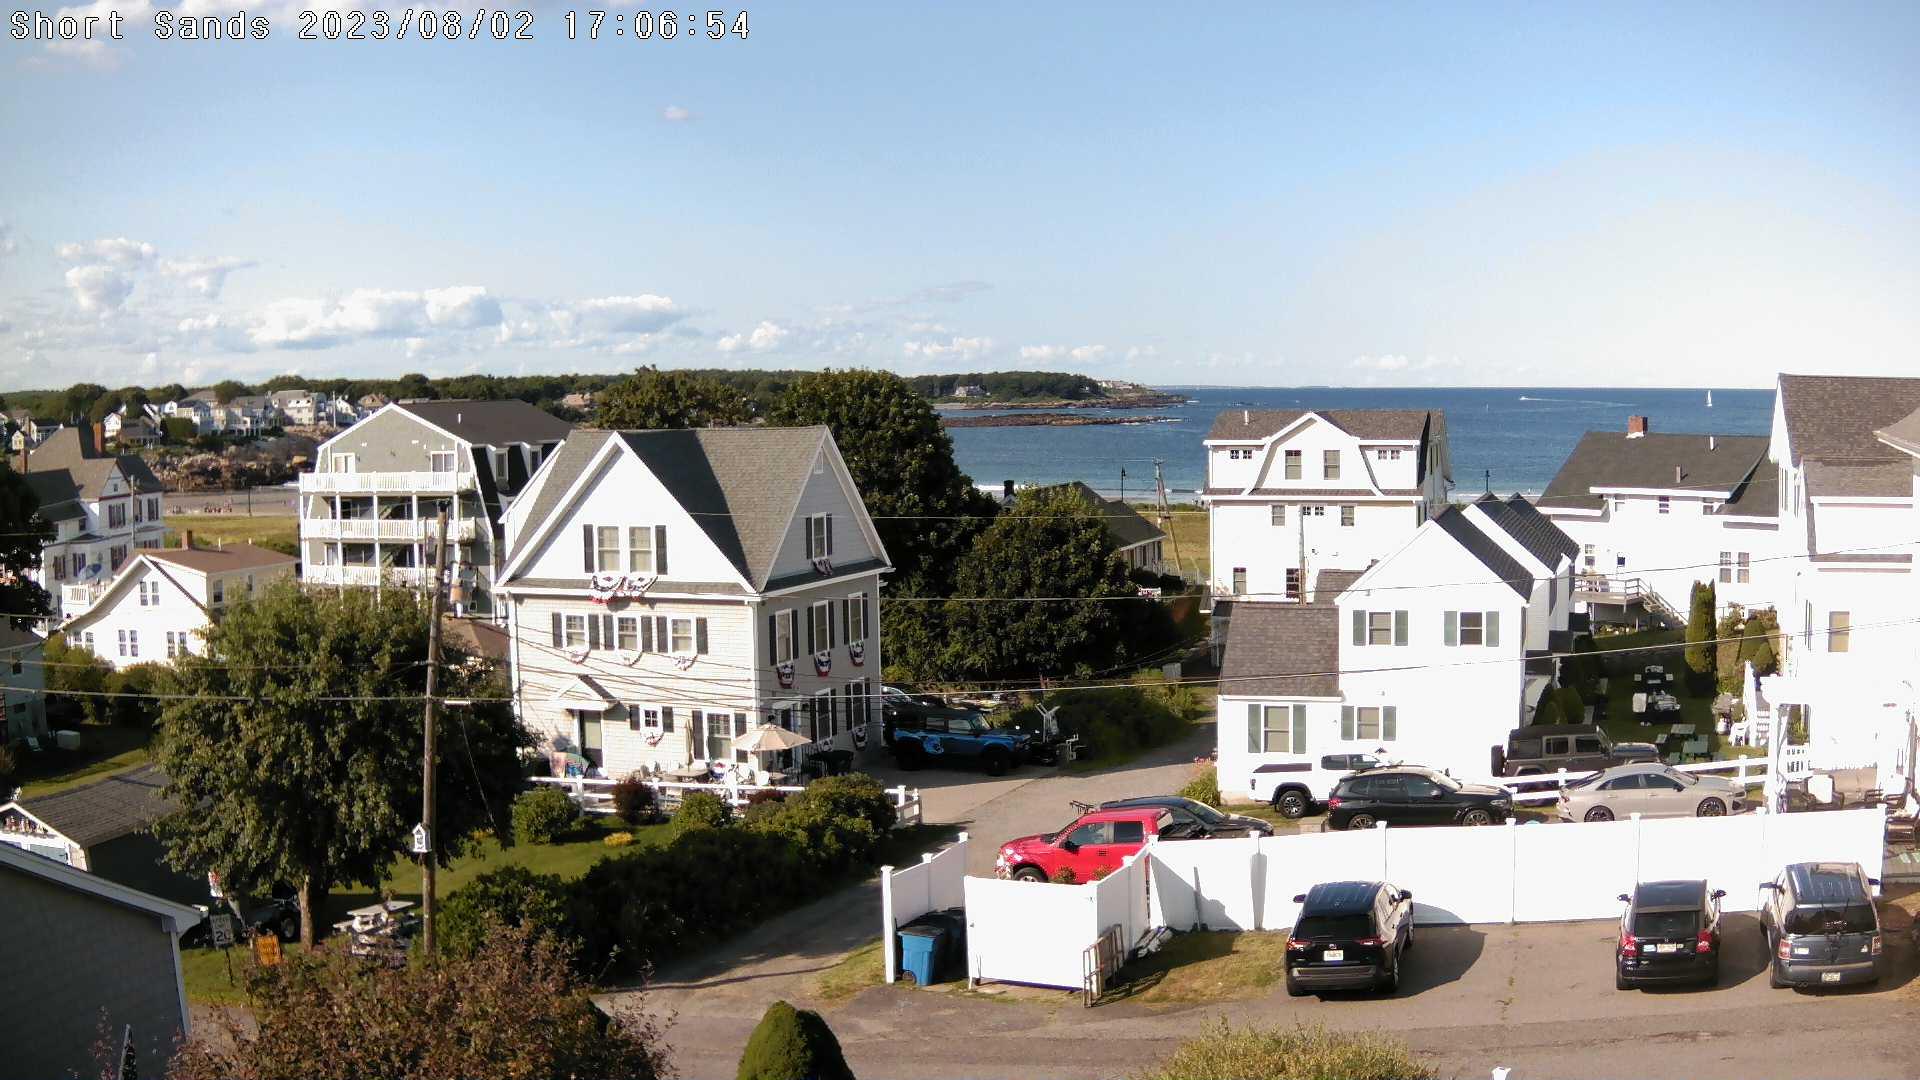 York Beach, Maine Ven. 17:07